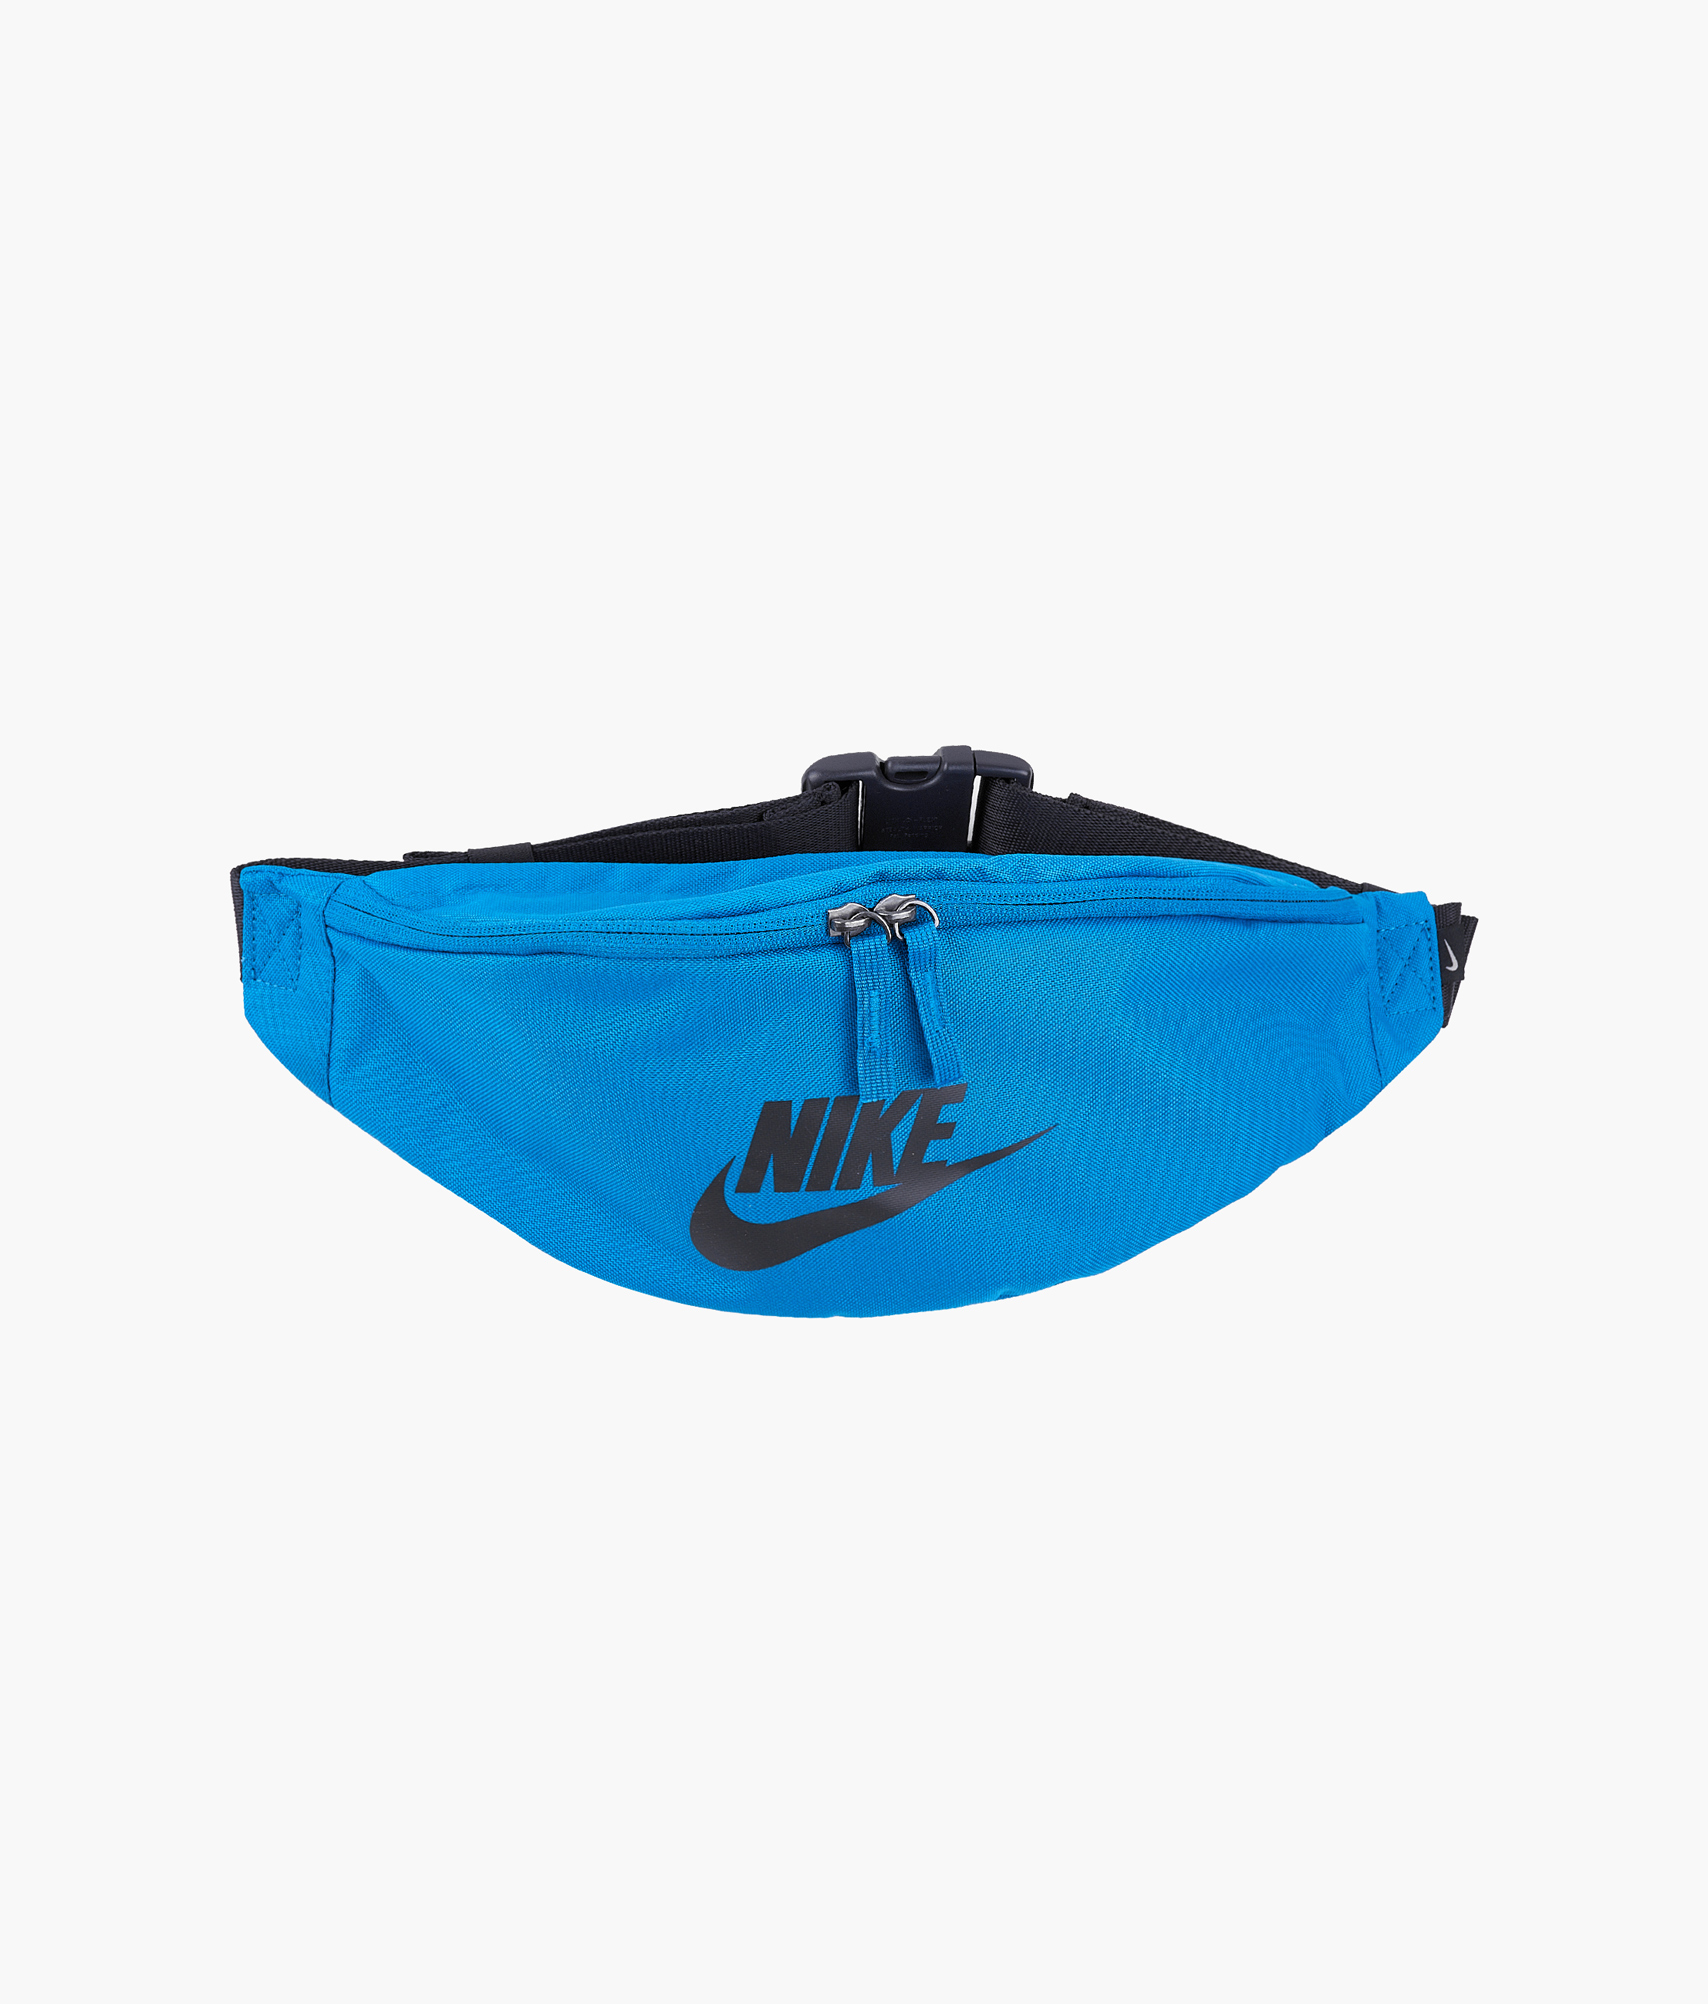 Сумка на пояс Nike Nike Цвет-Синий nike сумка nike core small items 3 0